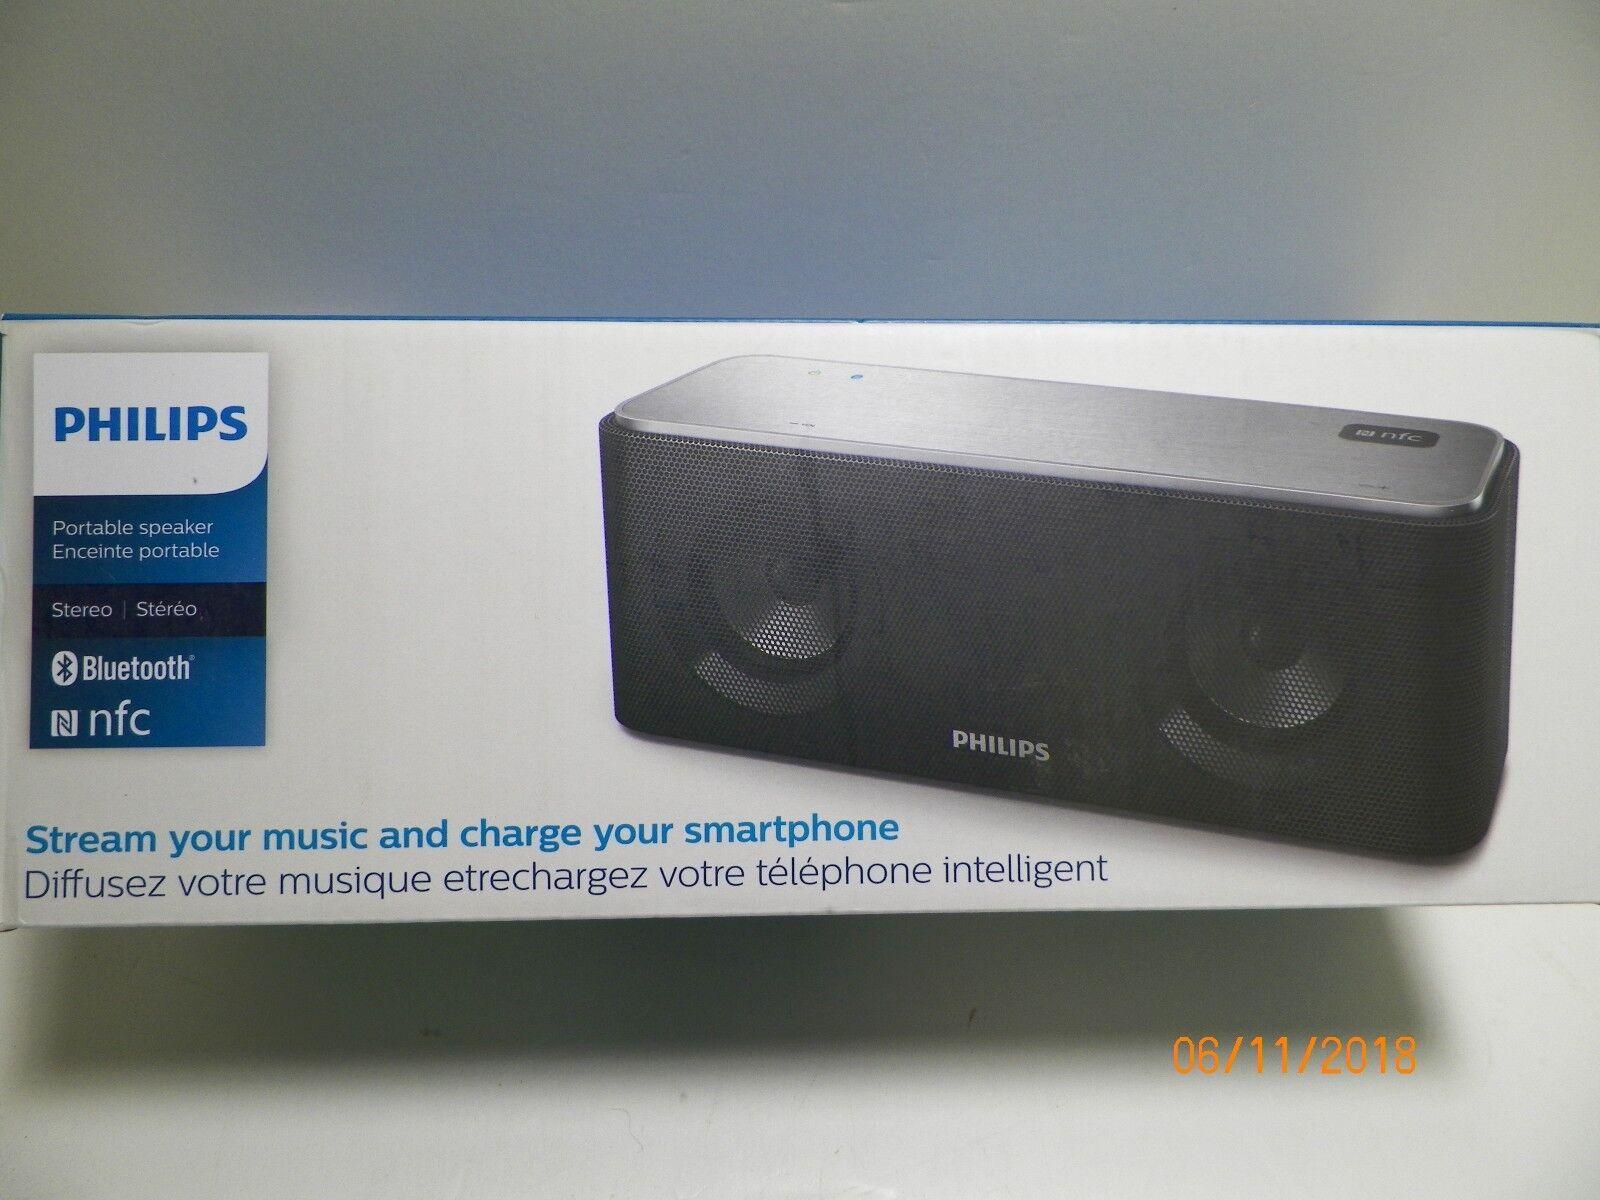 Philips - Sb365b Portable Wireless Bluetooth Speaker - Black